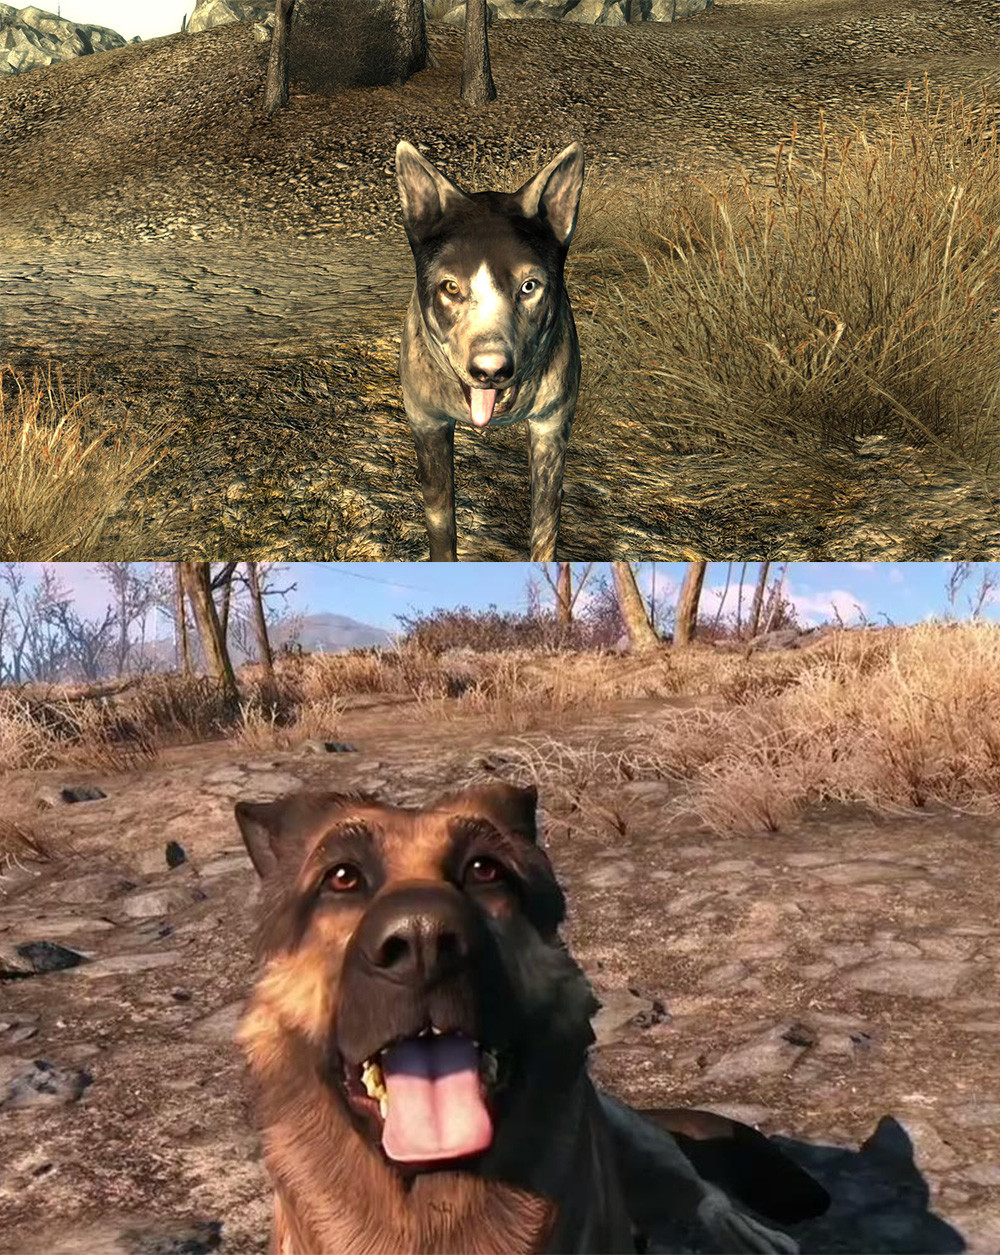 Fallout 3 picsporn fucking comic